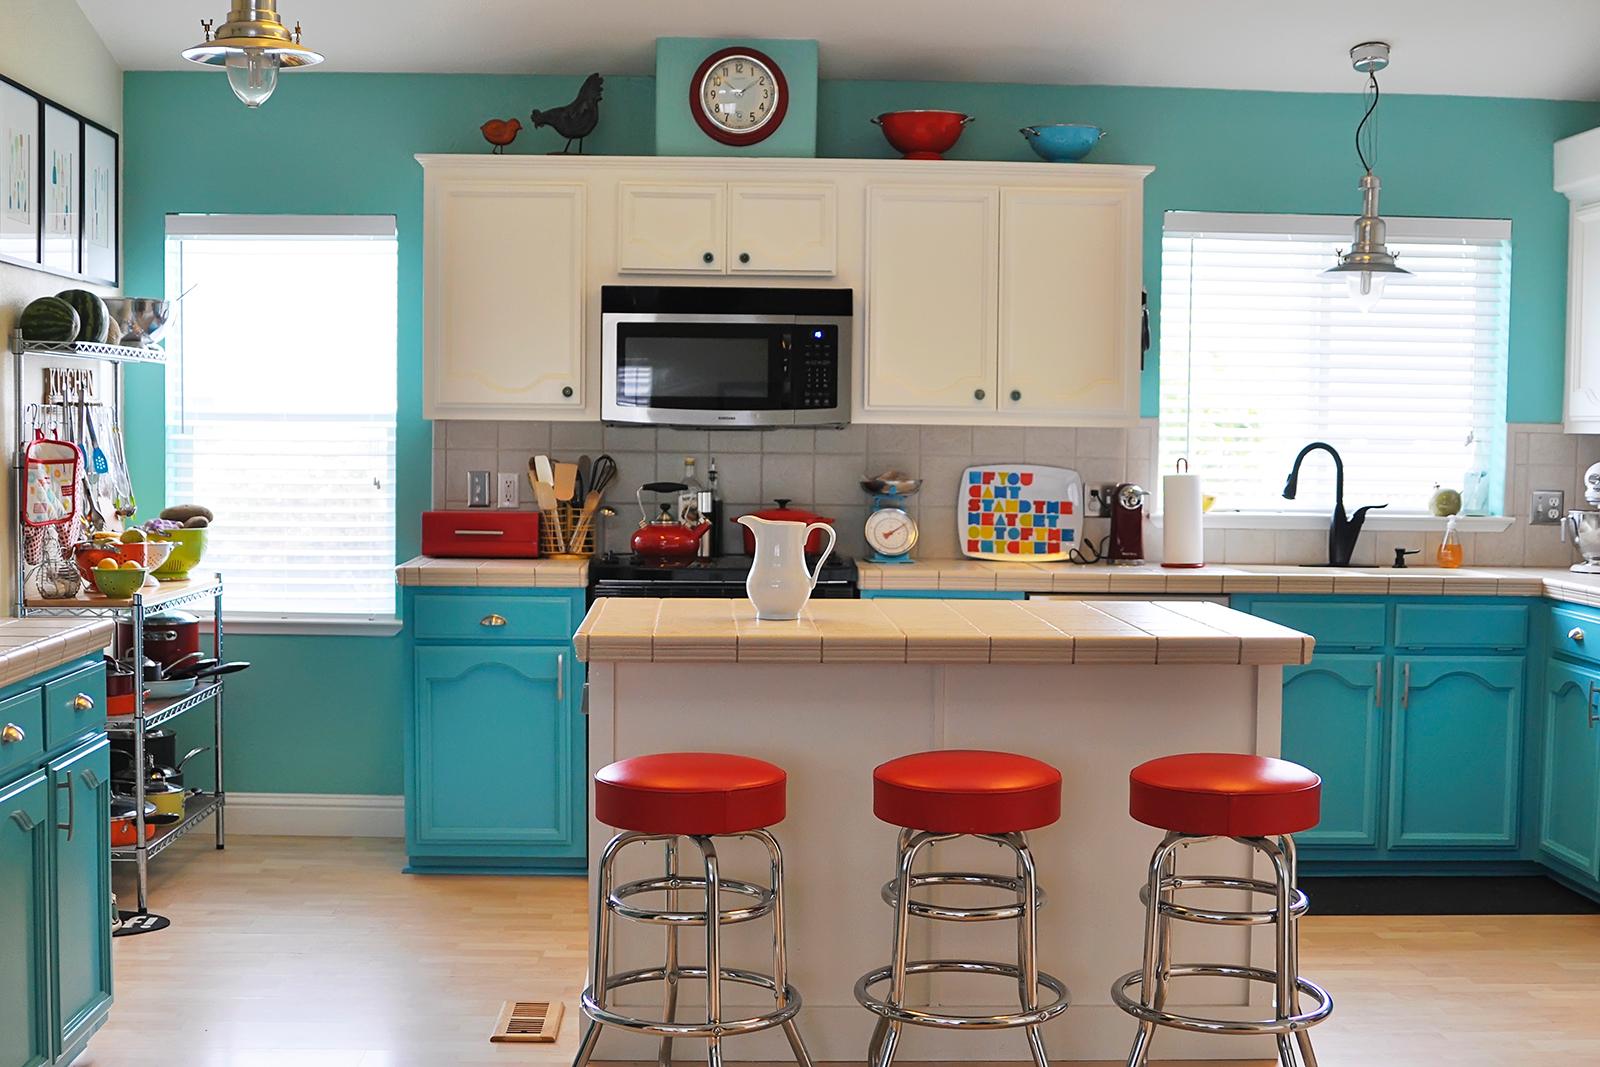 remodeling kitchen kitchen remodeling decisions youu0027ll never regret FGHHNGD